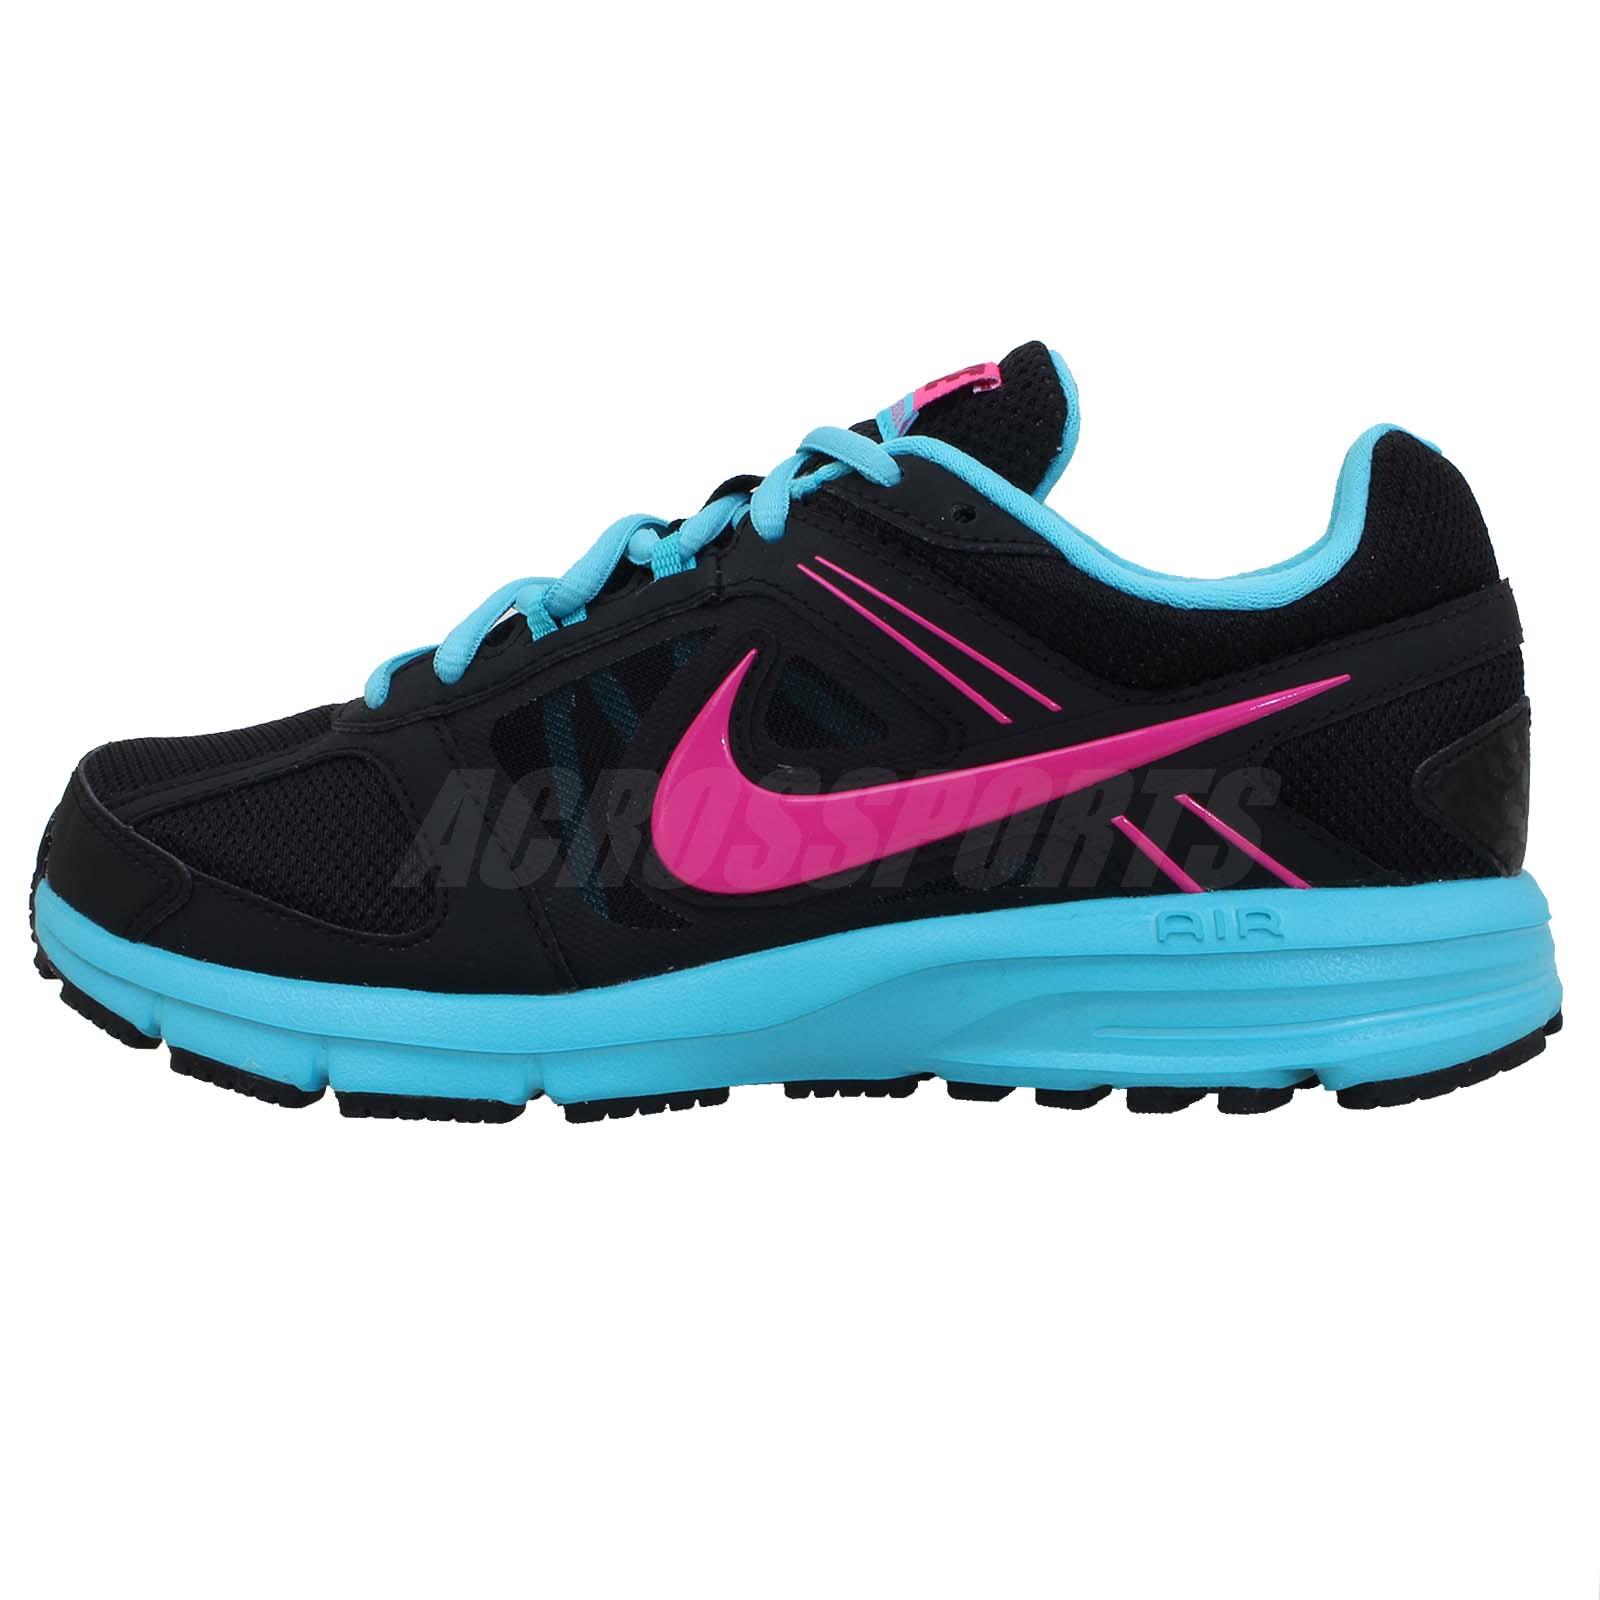 Tiffany Nike Shoes Canada